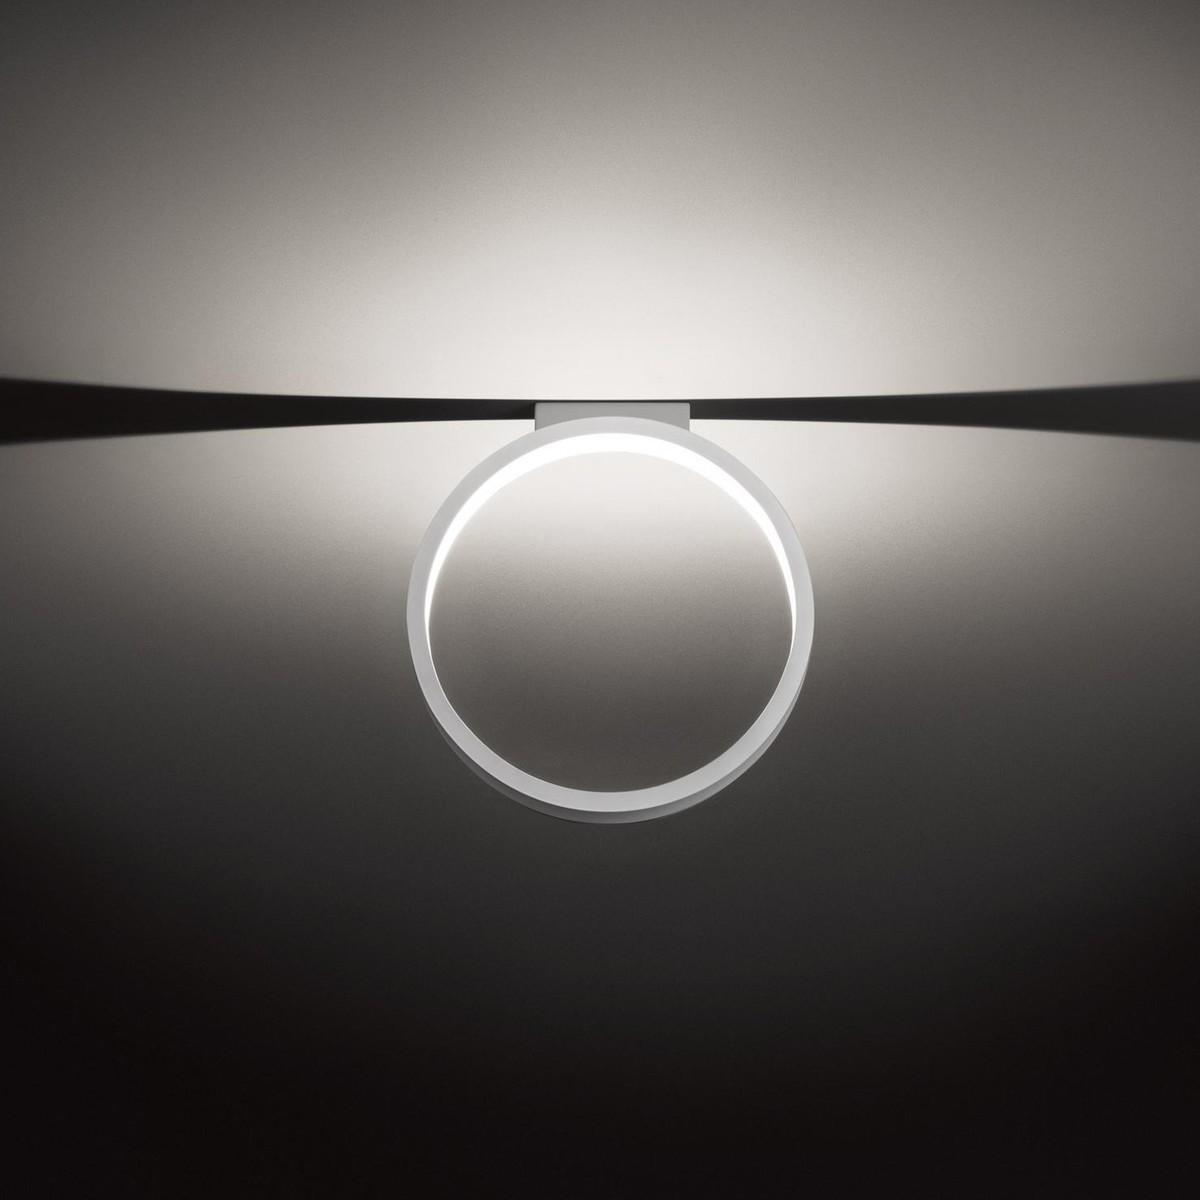 led deckenleuchte cham leon inspirierendes design f r wohnm bel. Black Bedroom Furniture Sets. Home Design Ideas